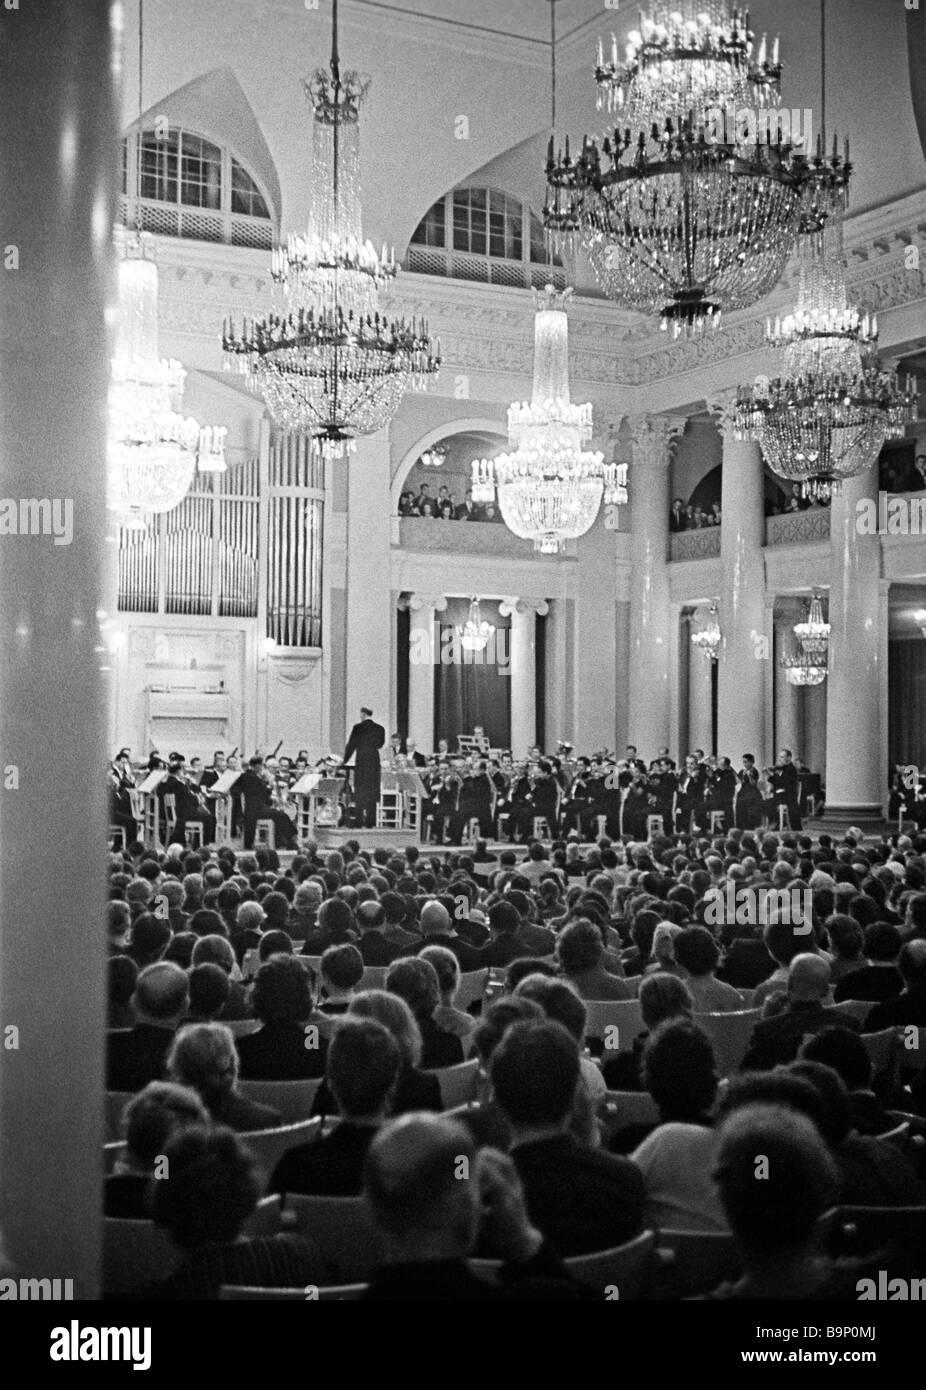 The premiere of Dmitry Shostakovich s Symphony No 12 at the Leningrad philharmonic - Stock Image